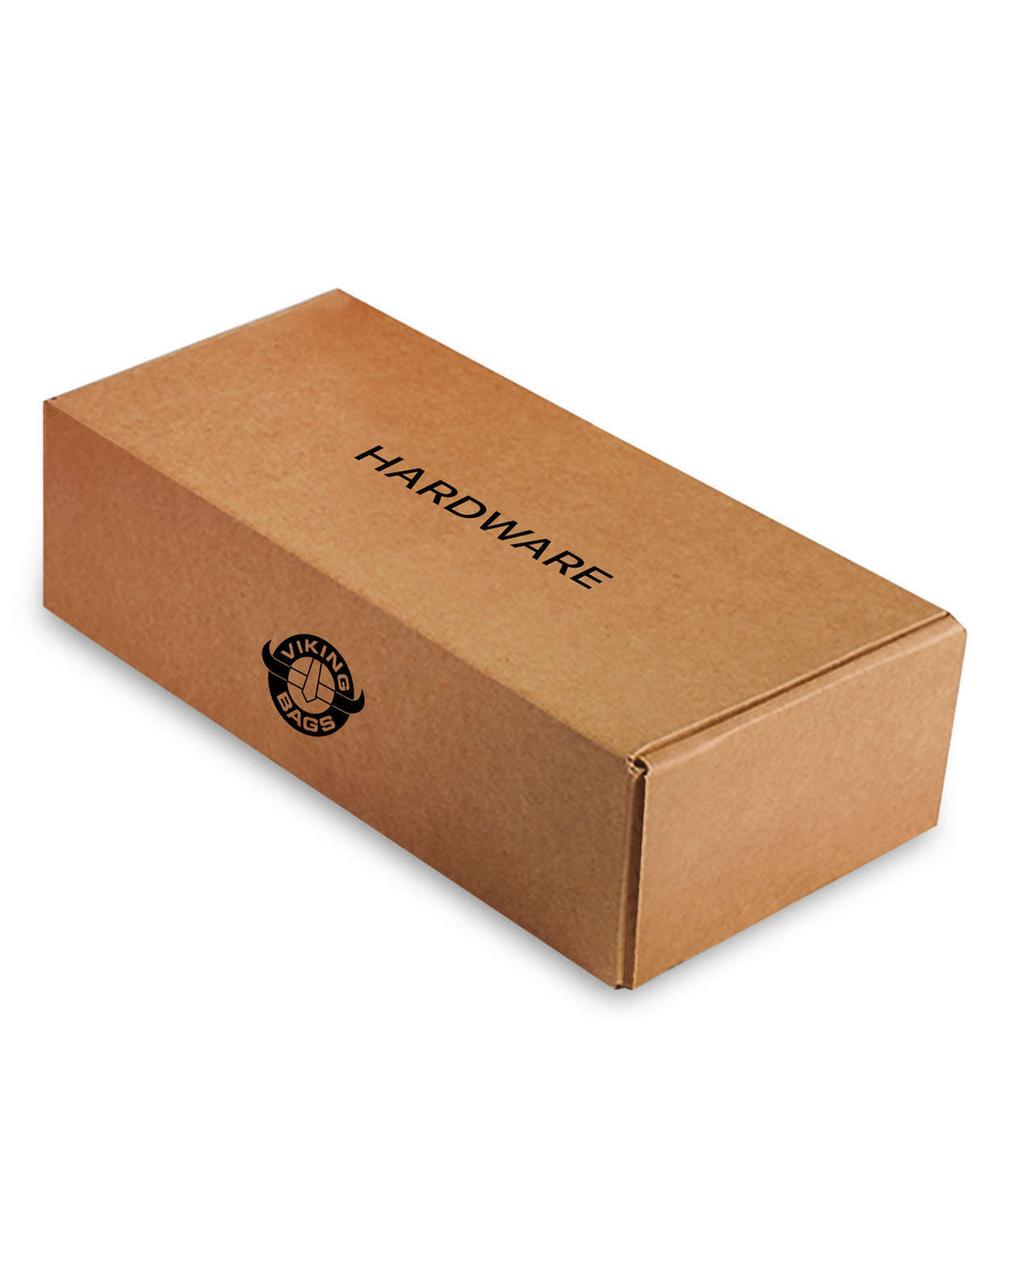 Triumph Rocket III Range Charger Braided Medium Motorcycle Saddlebags Box